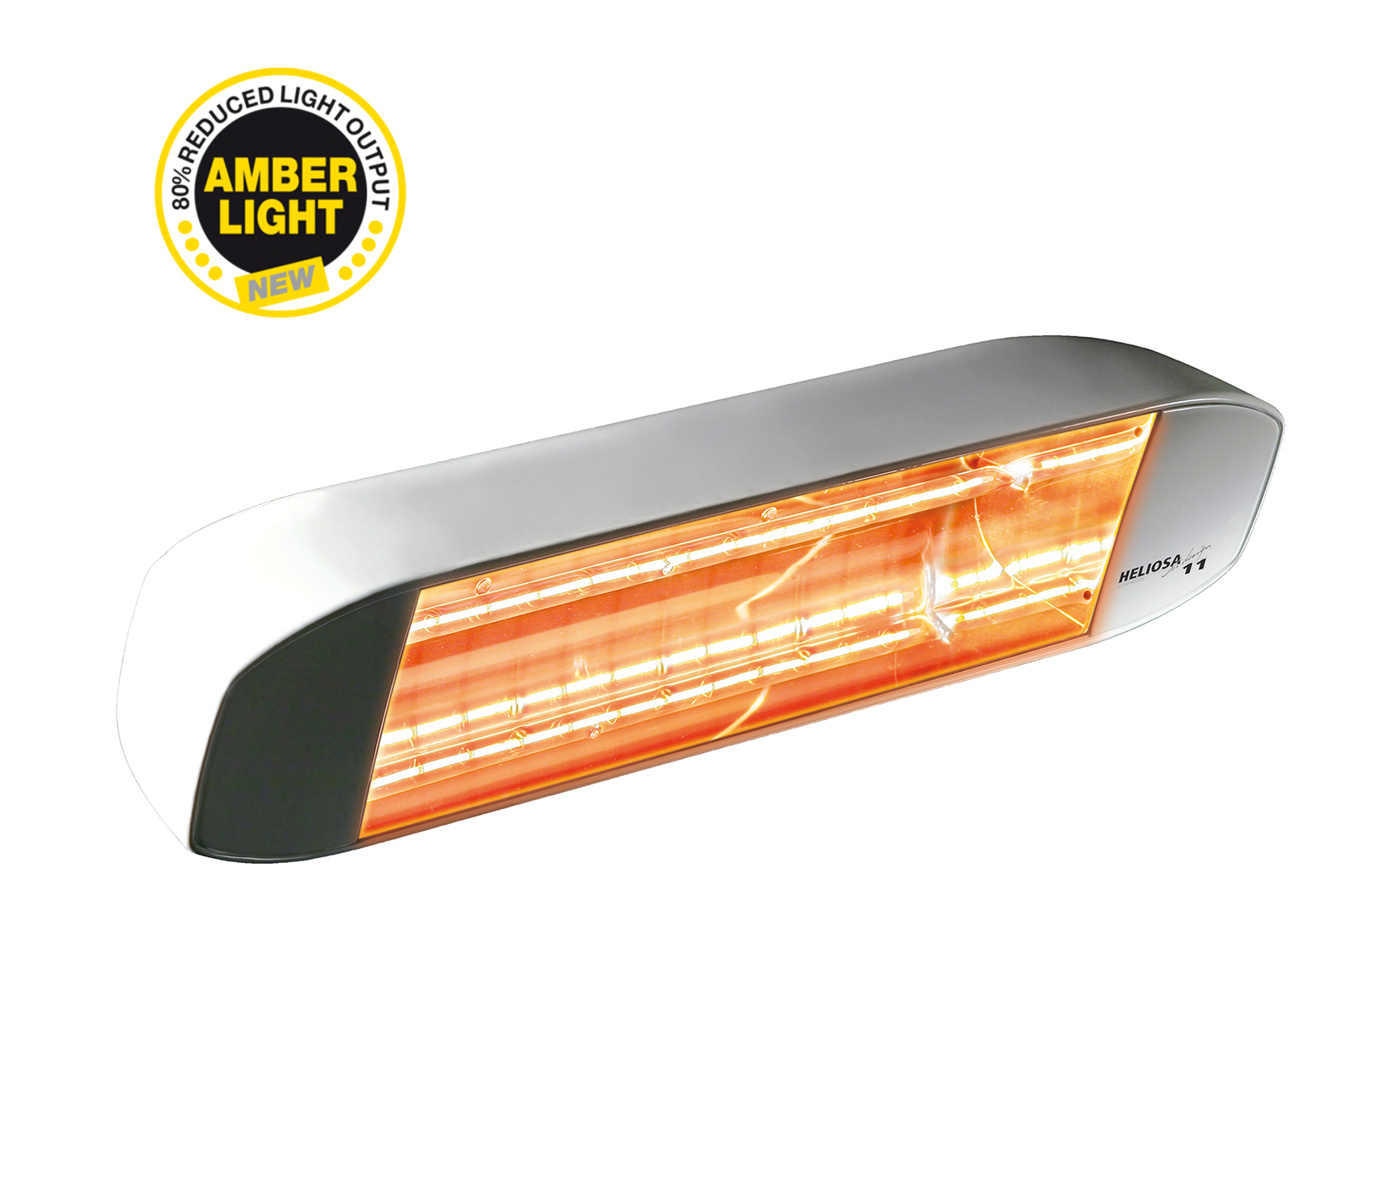 Heliosa 11 Amber Light 1500 Watt